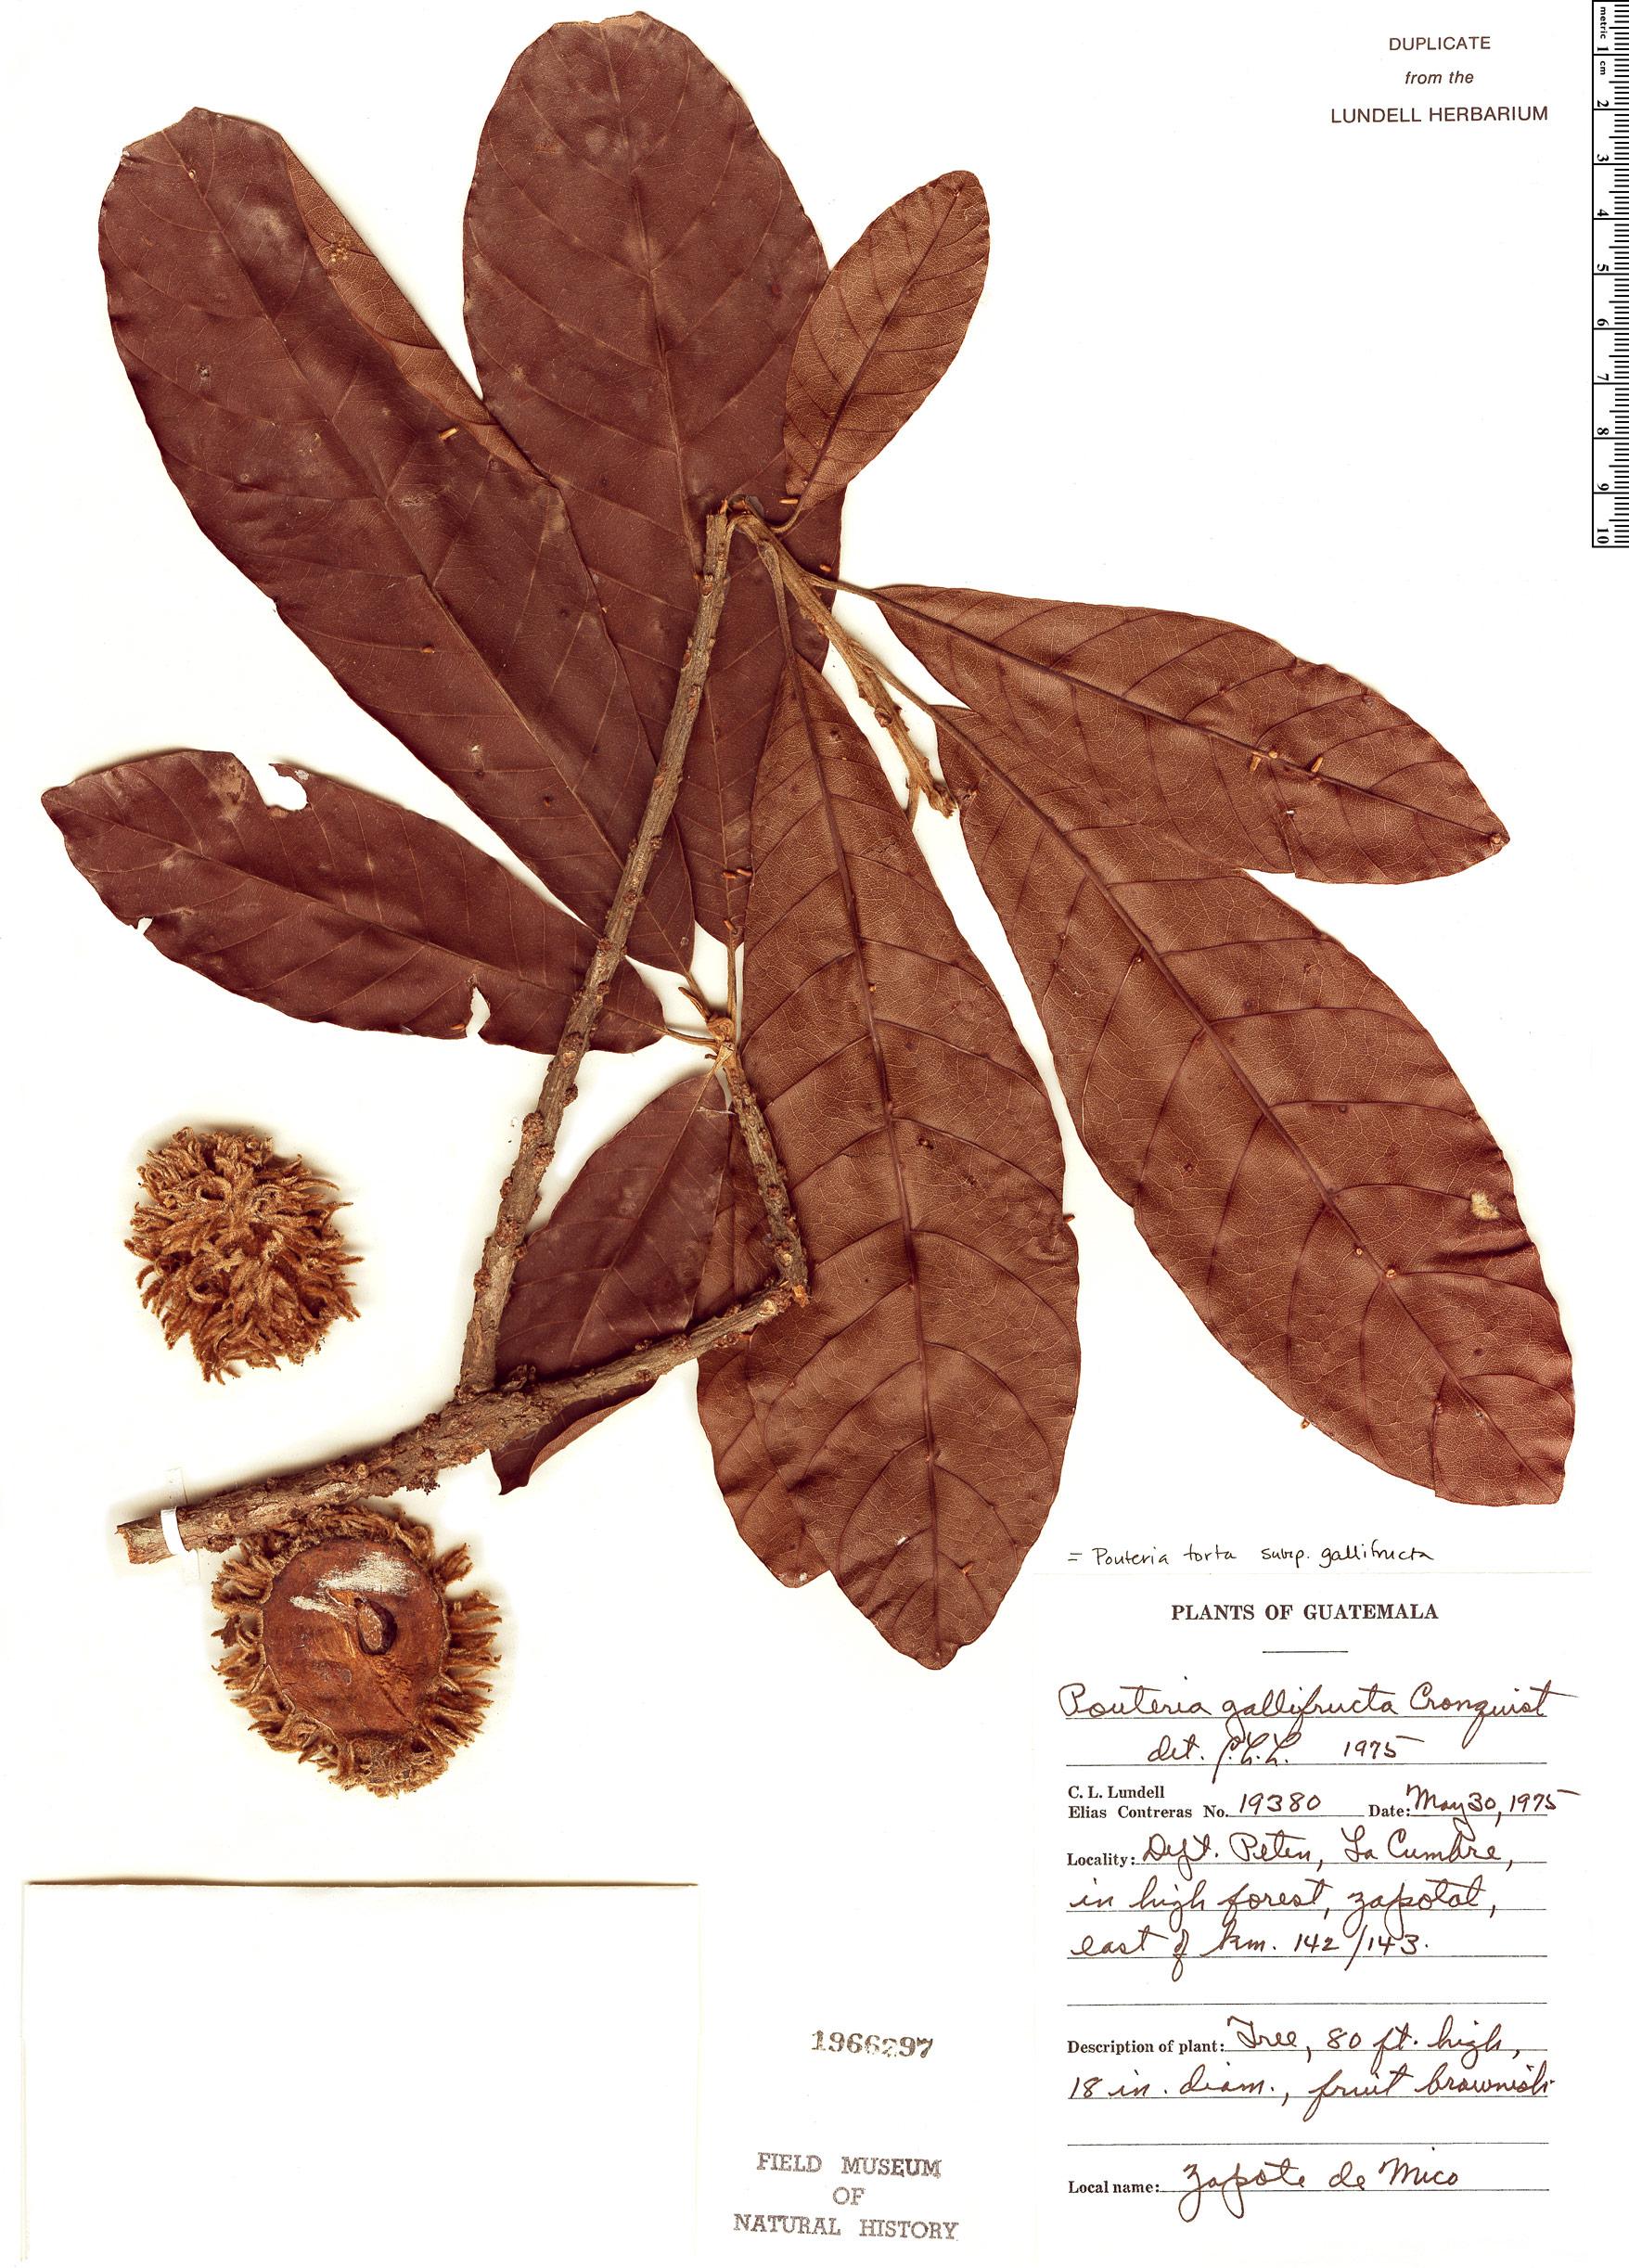 Specimen: Pouteria torta